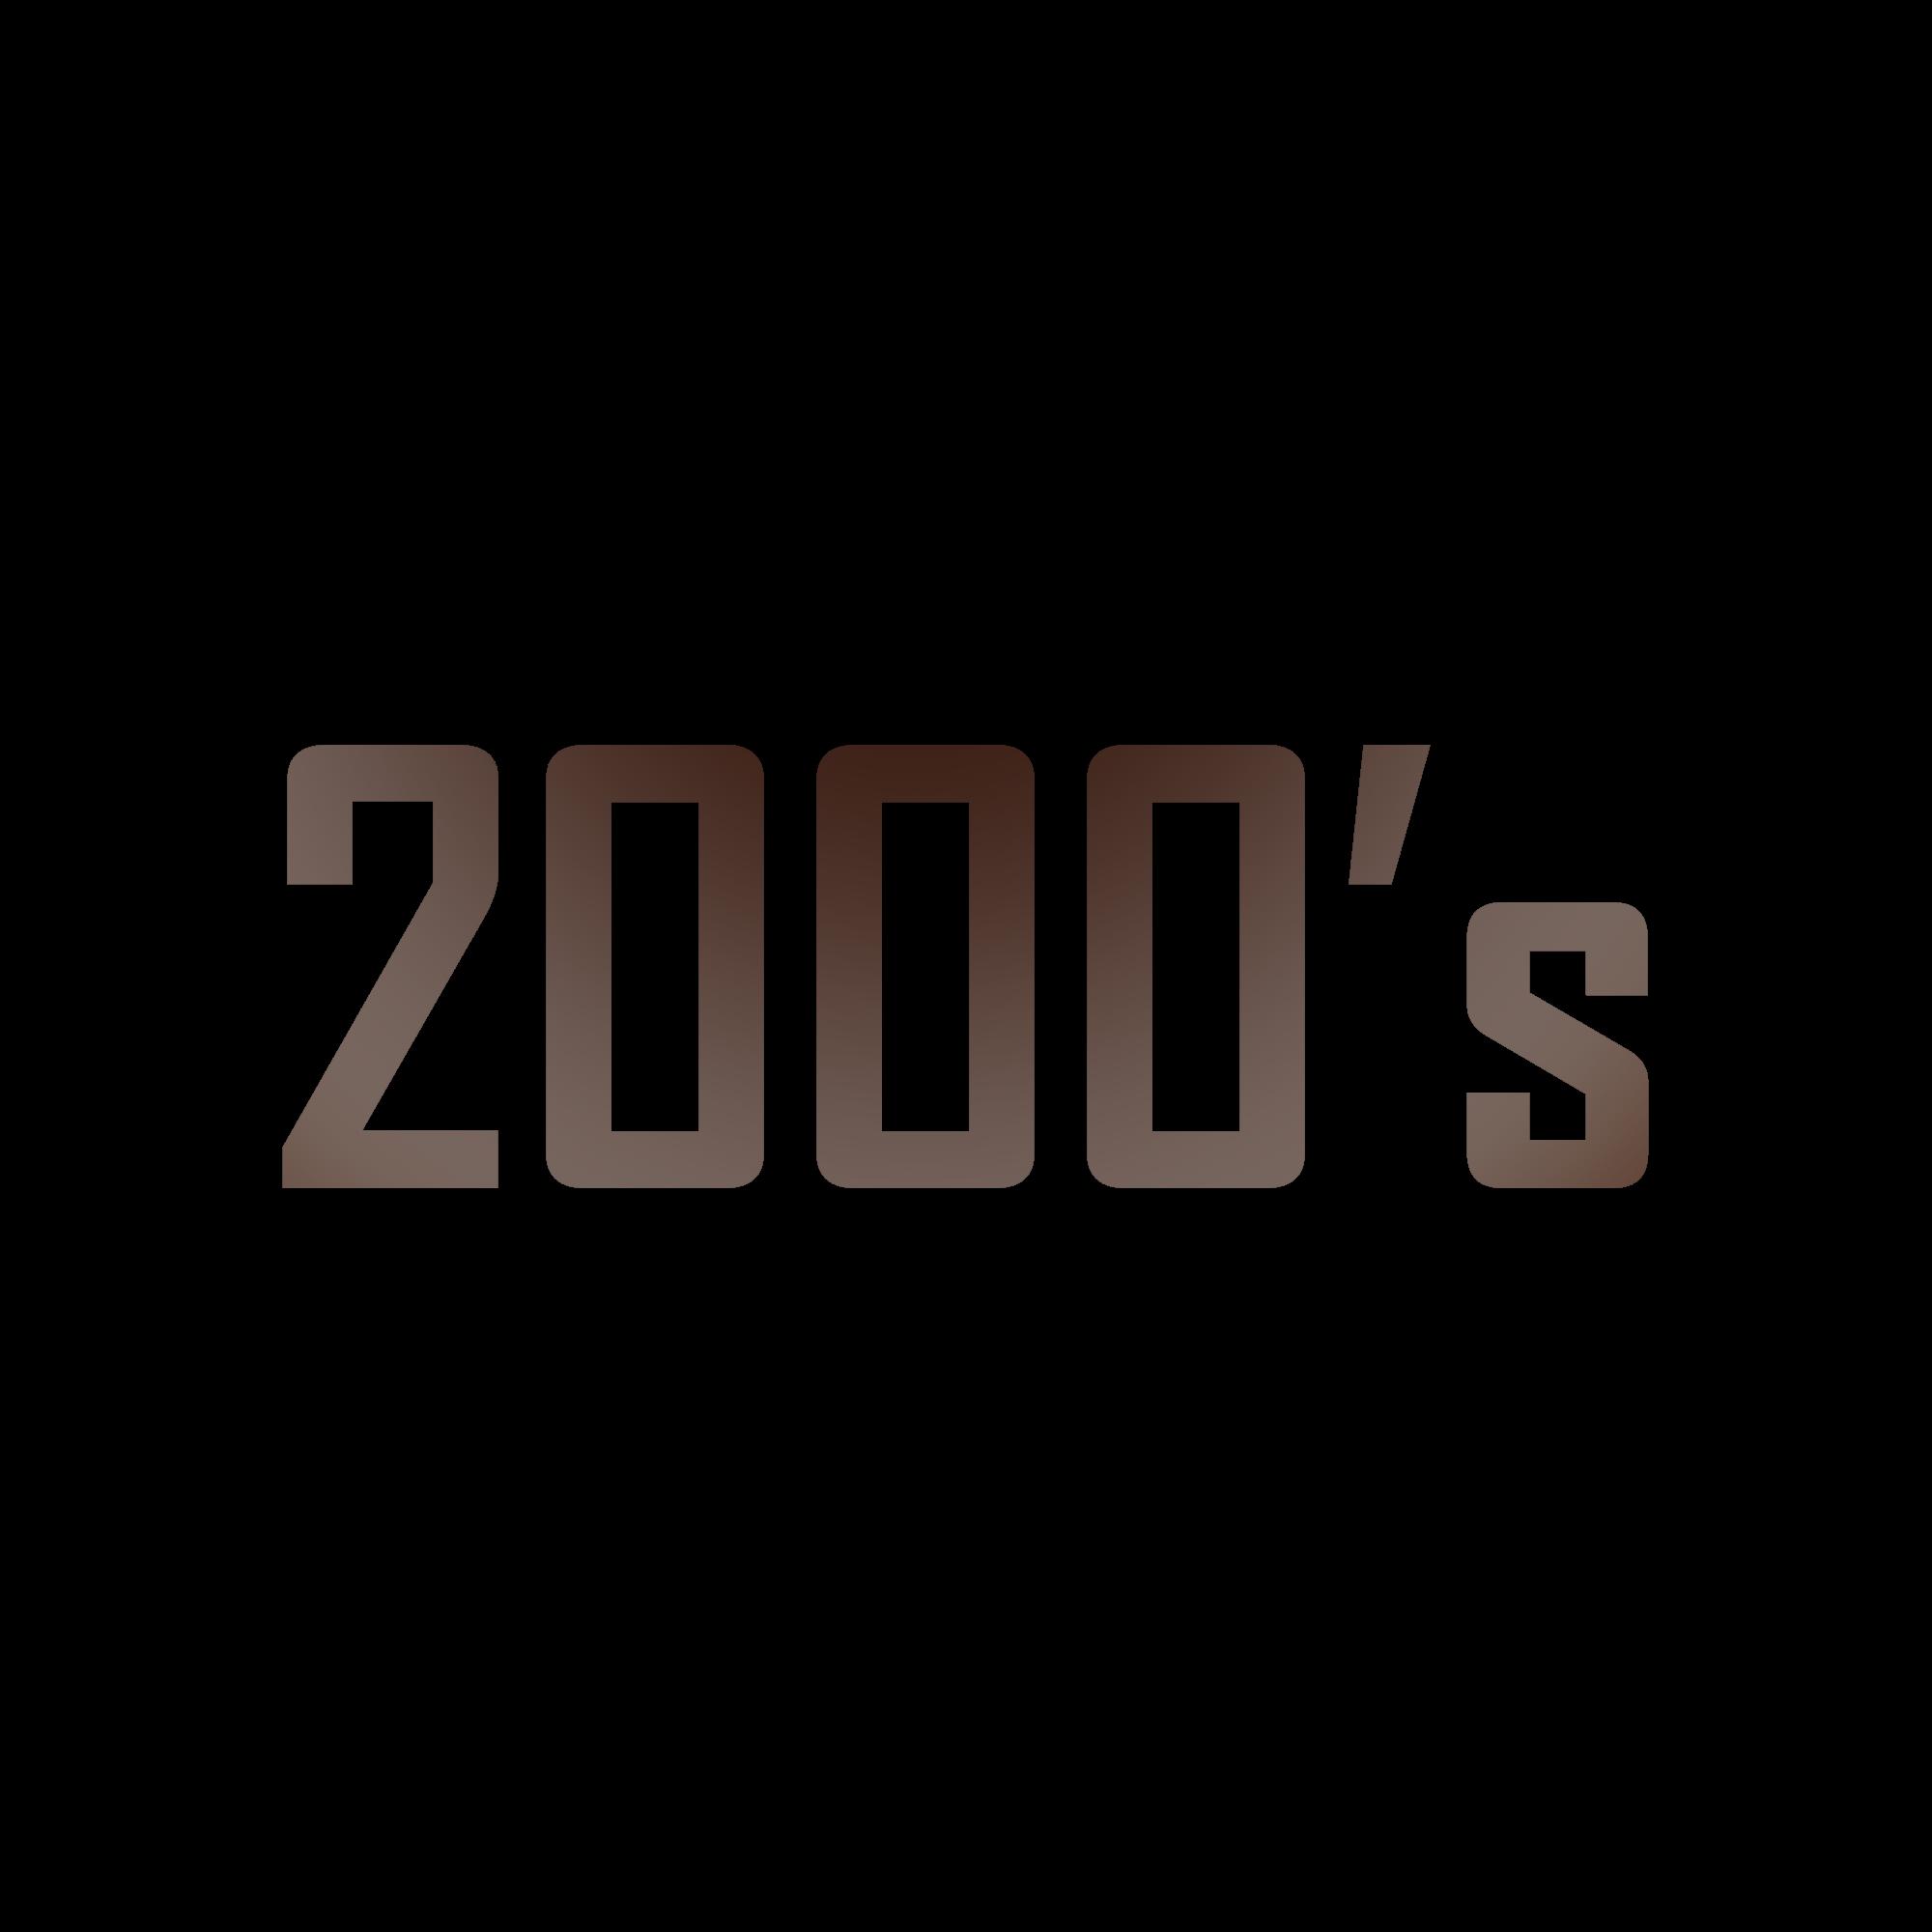 2000's (????? ???????)